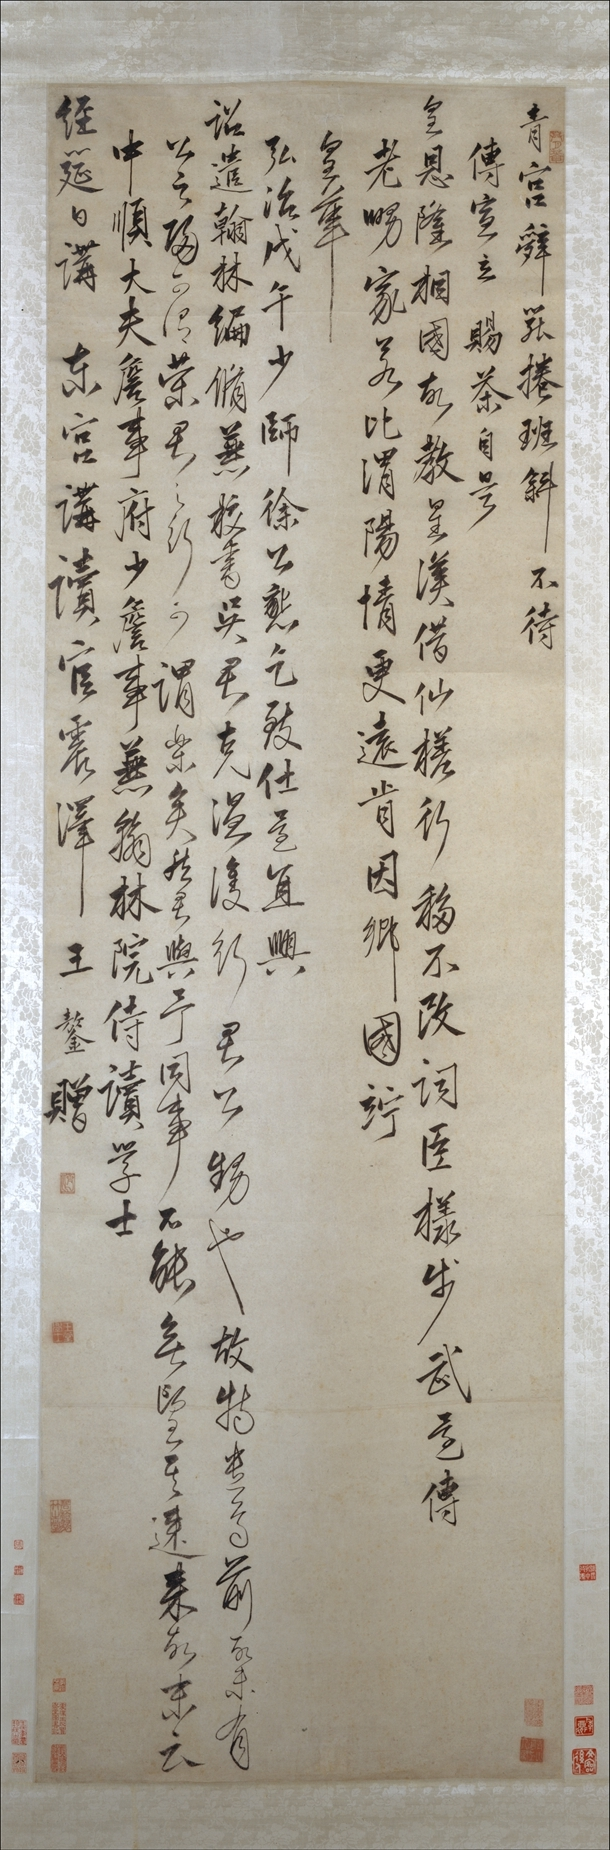 File:明 王鏊 贈別詩 軸-Farewell Poem MET DT4236 jpg